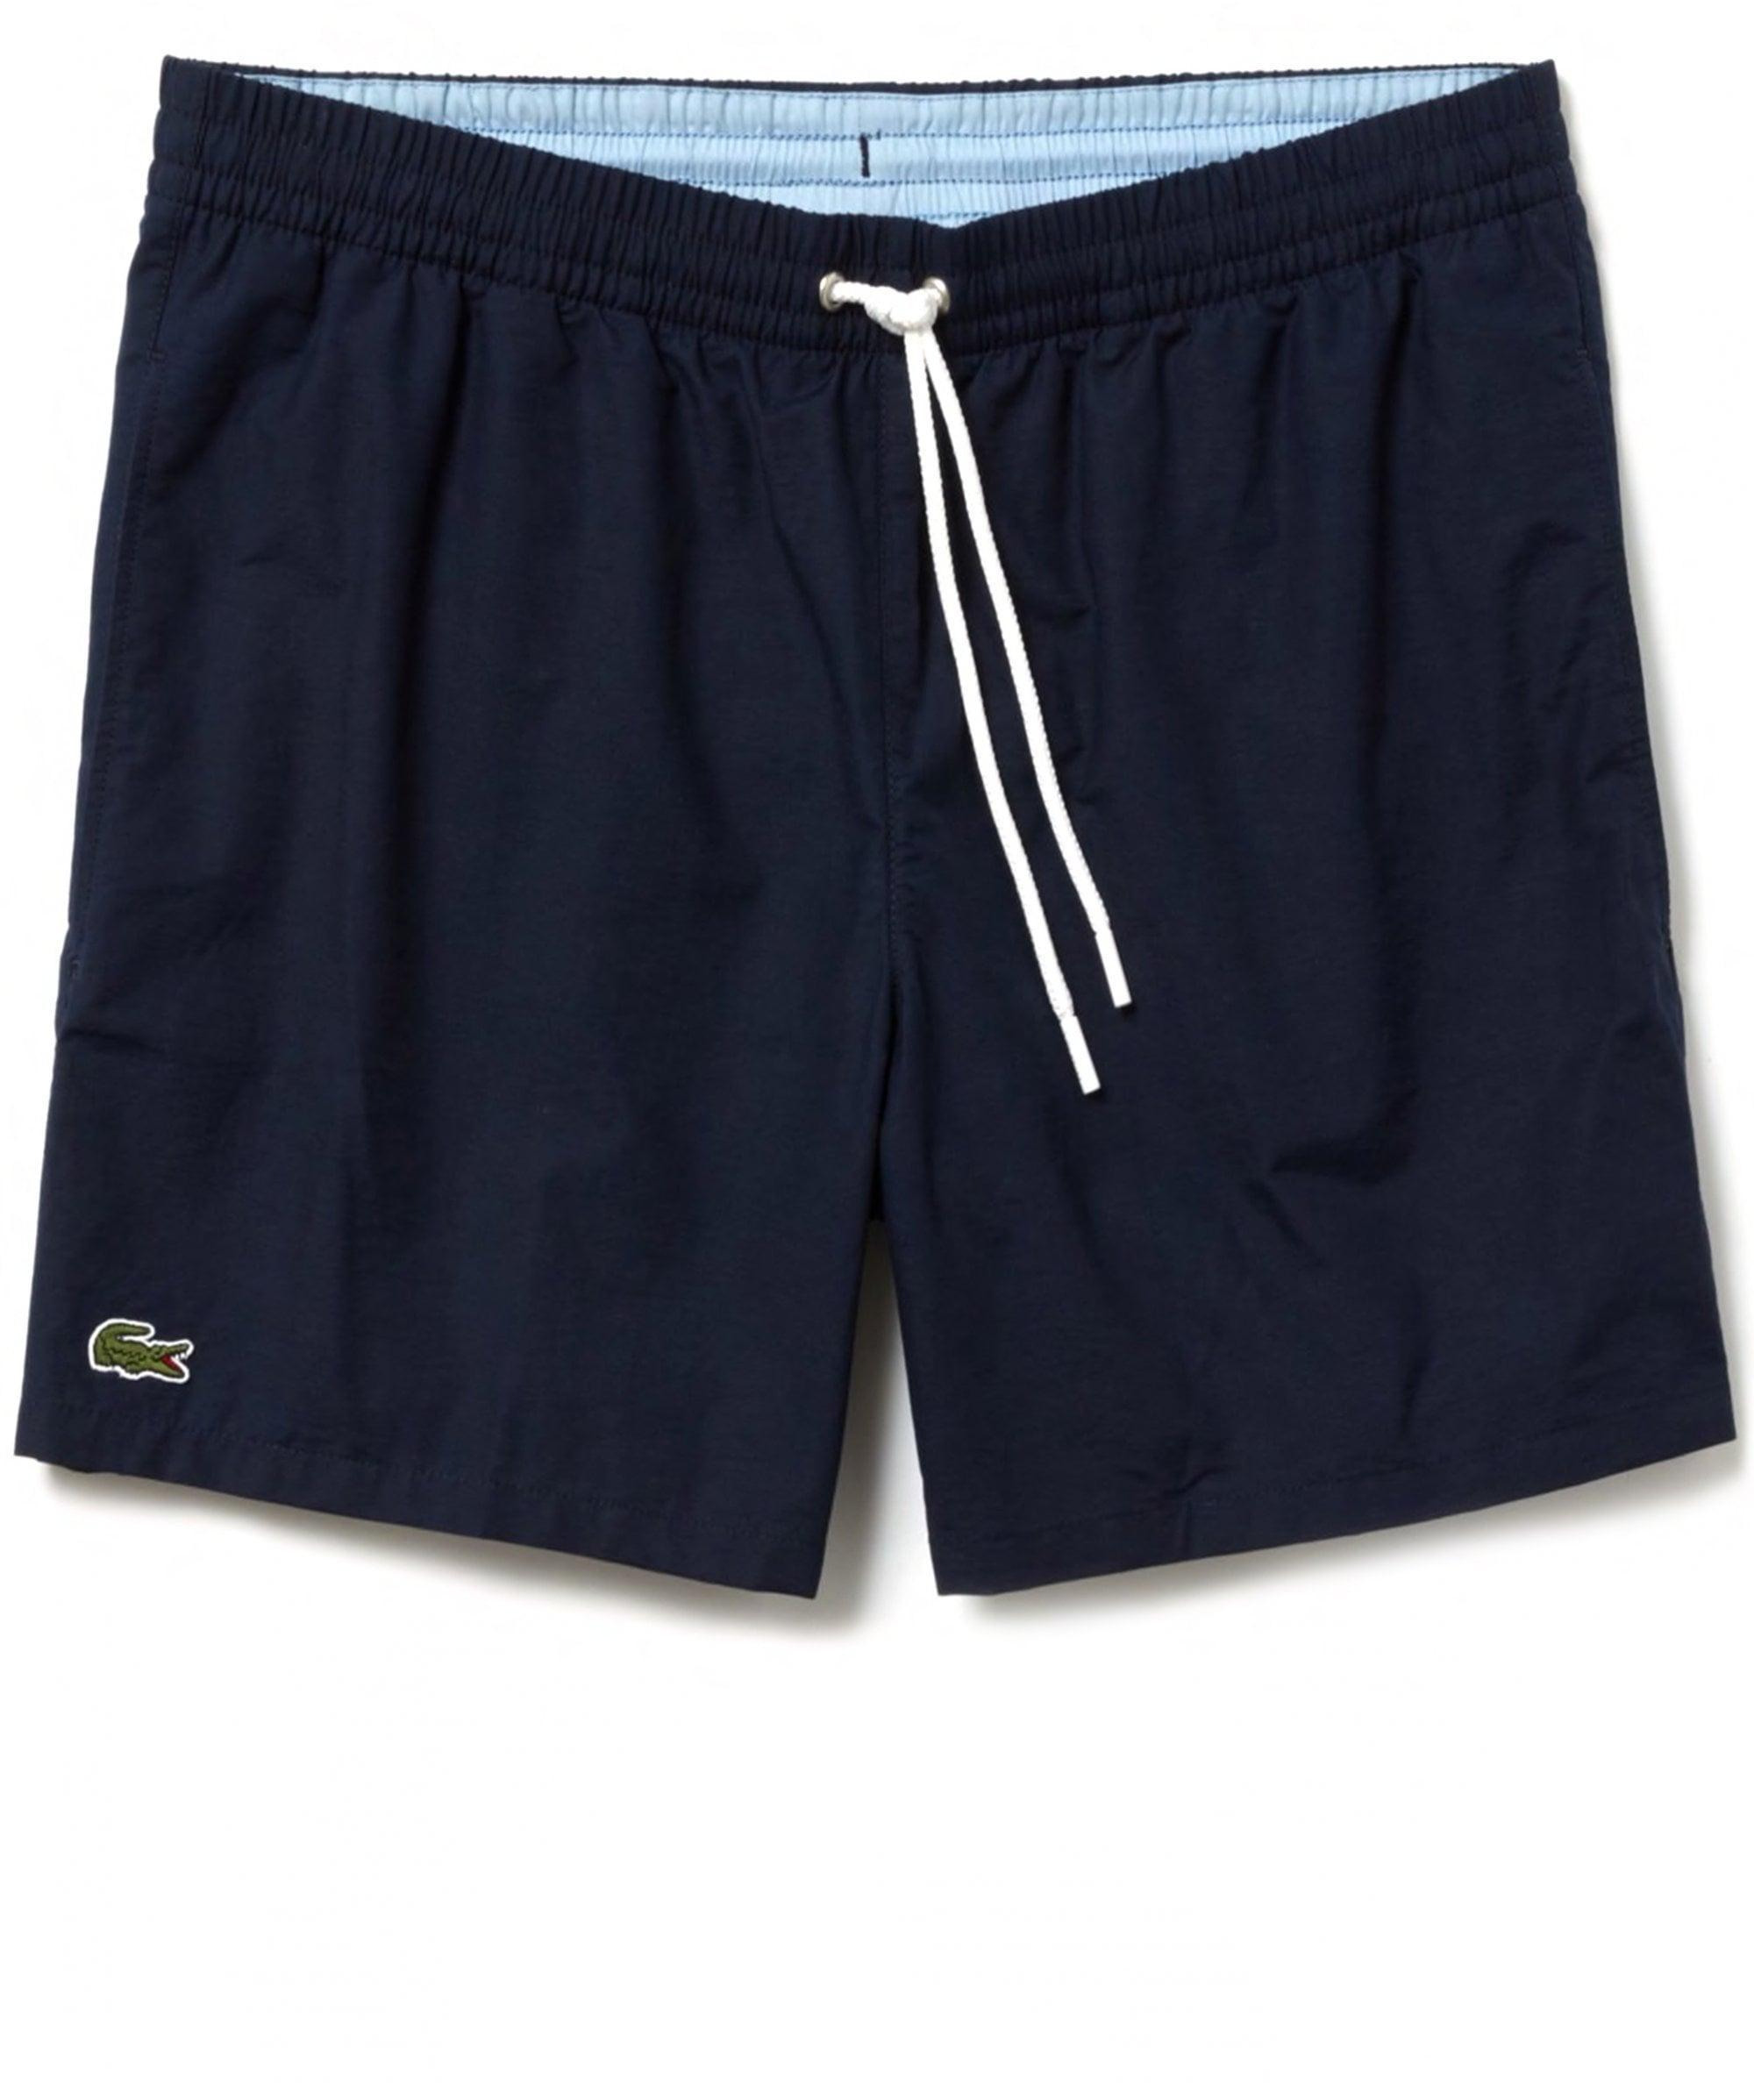 6c4e812d0c Lyst - Lacoste Taffeta Swim Shorts in Blue for Men